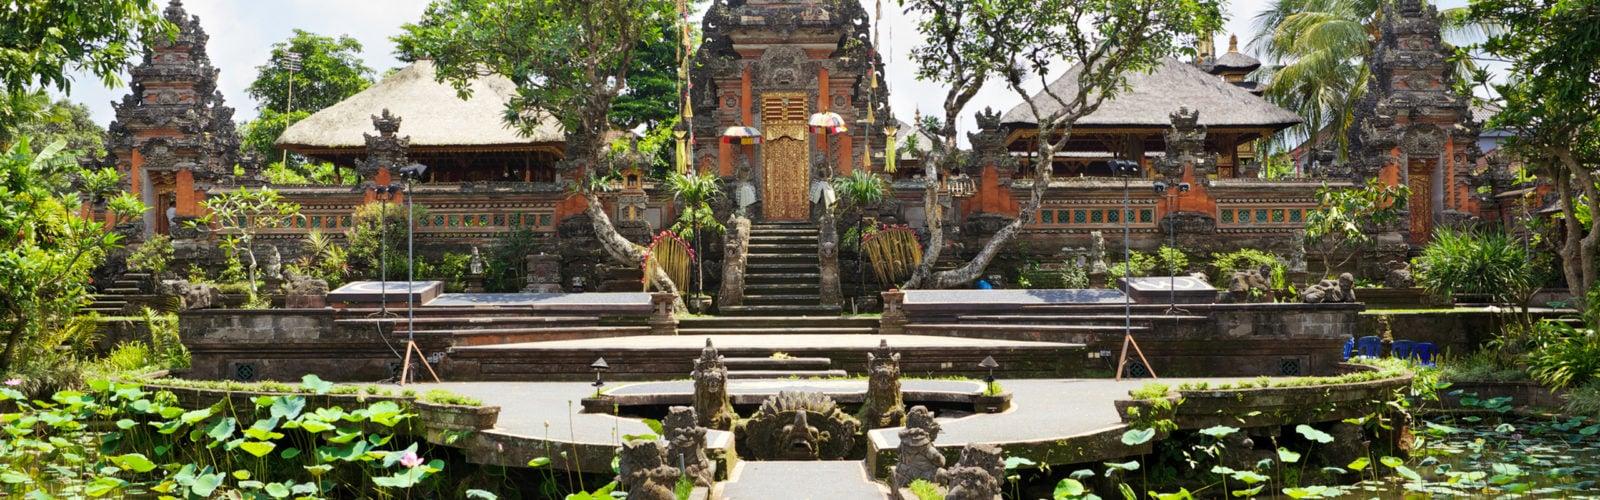 saraswati-temple-ubud